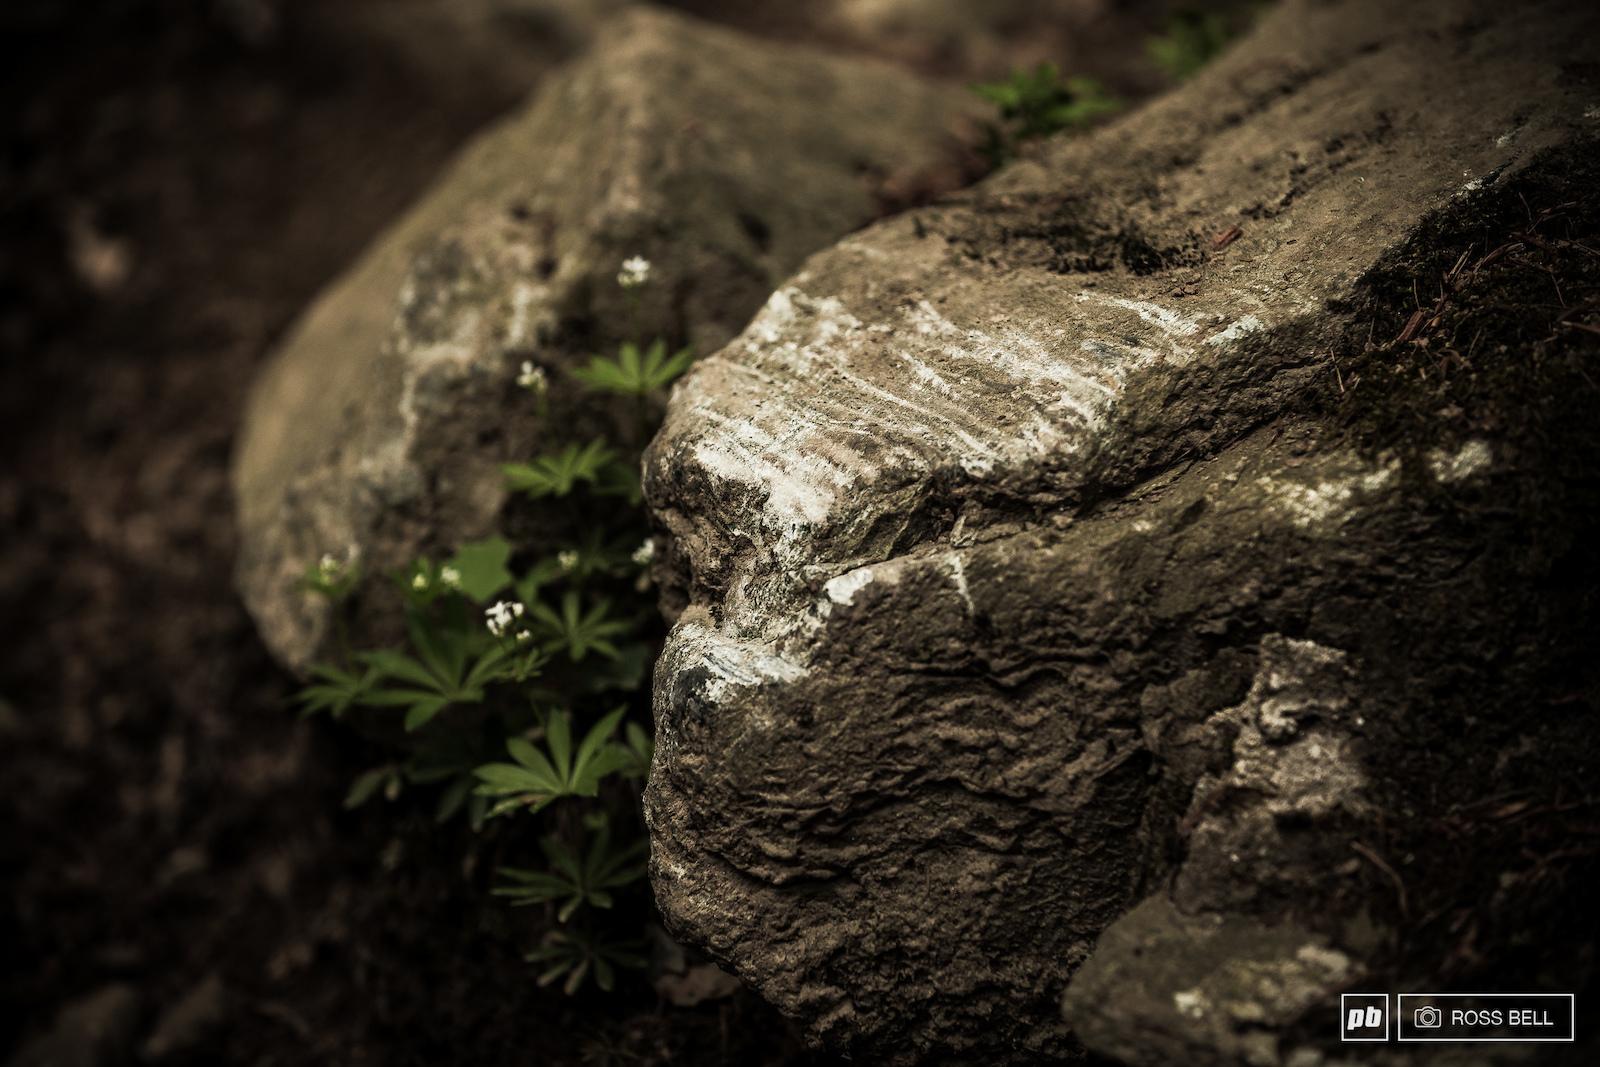 The rock garden has claimed many victims.